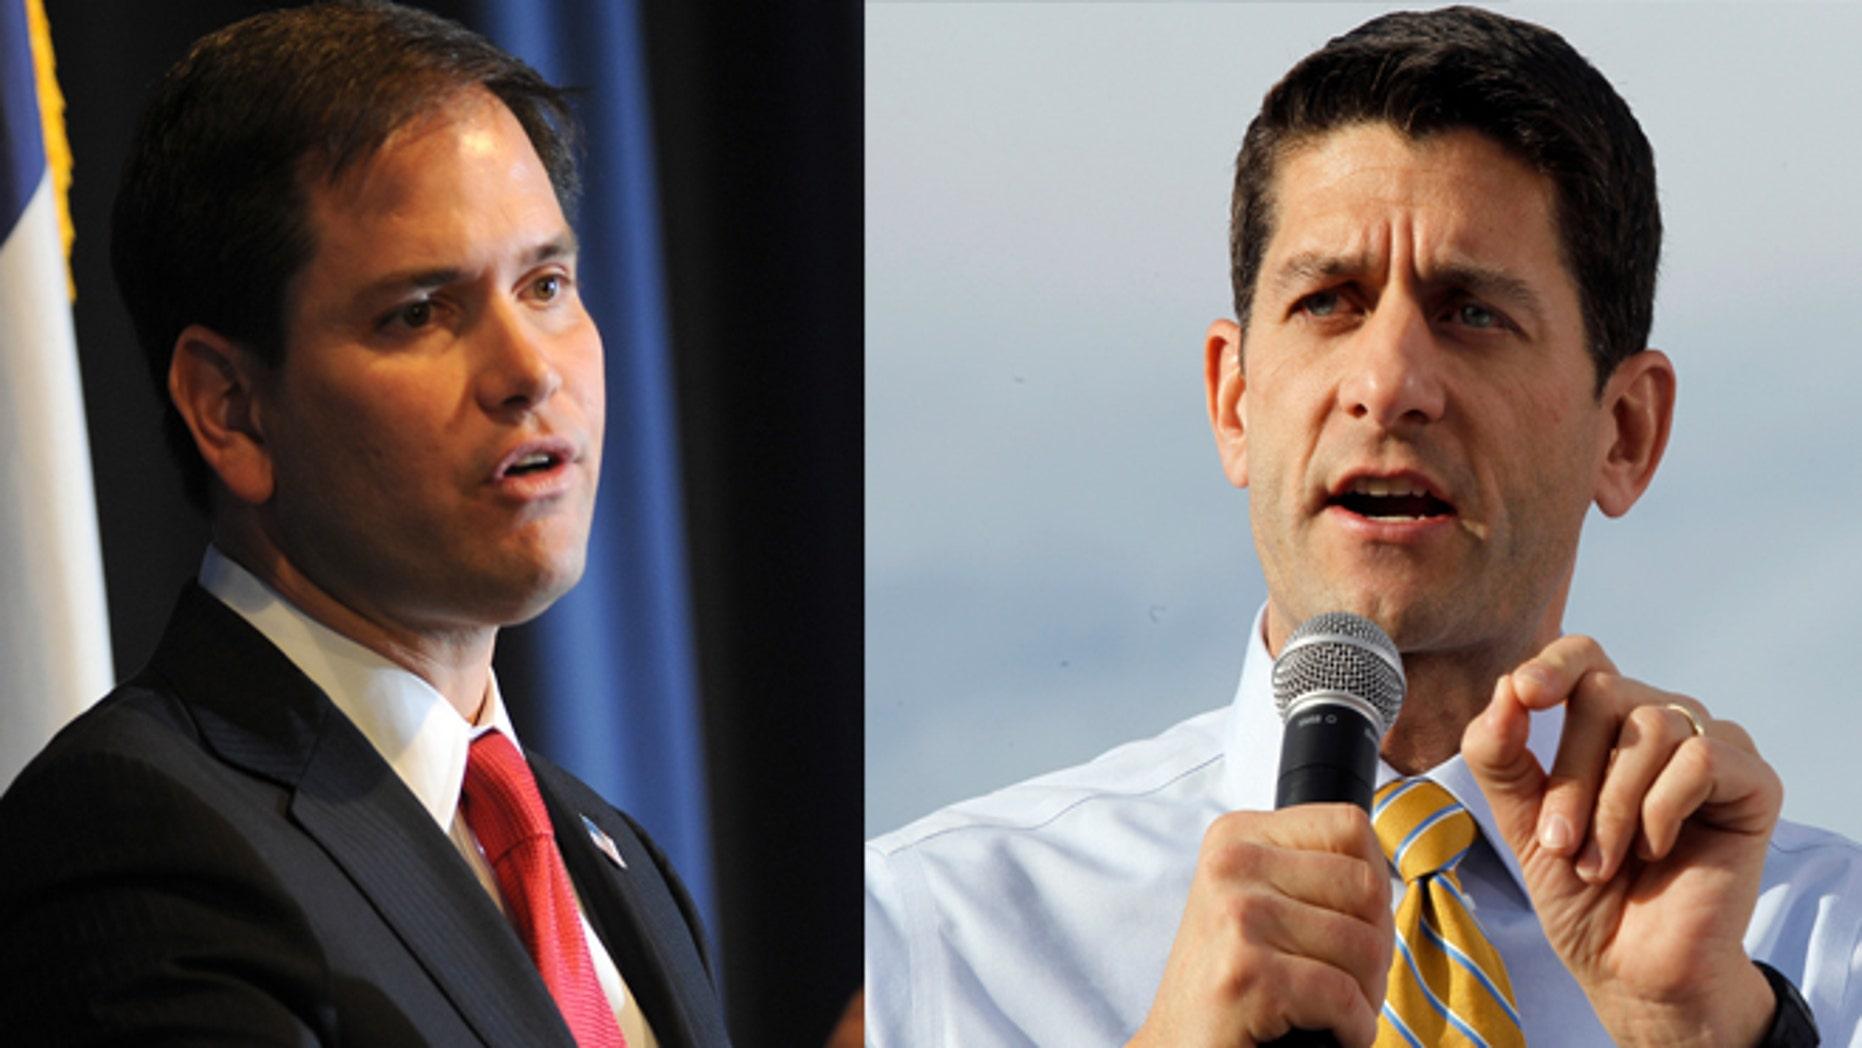 (LEFT) Sen. Marco Rubo (R-FL) and (RIGHT) Rep. Paul Ryan (WI).